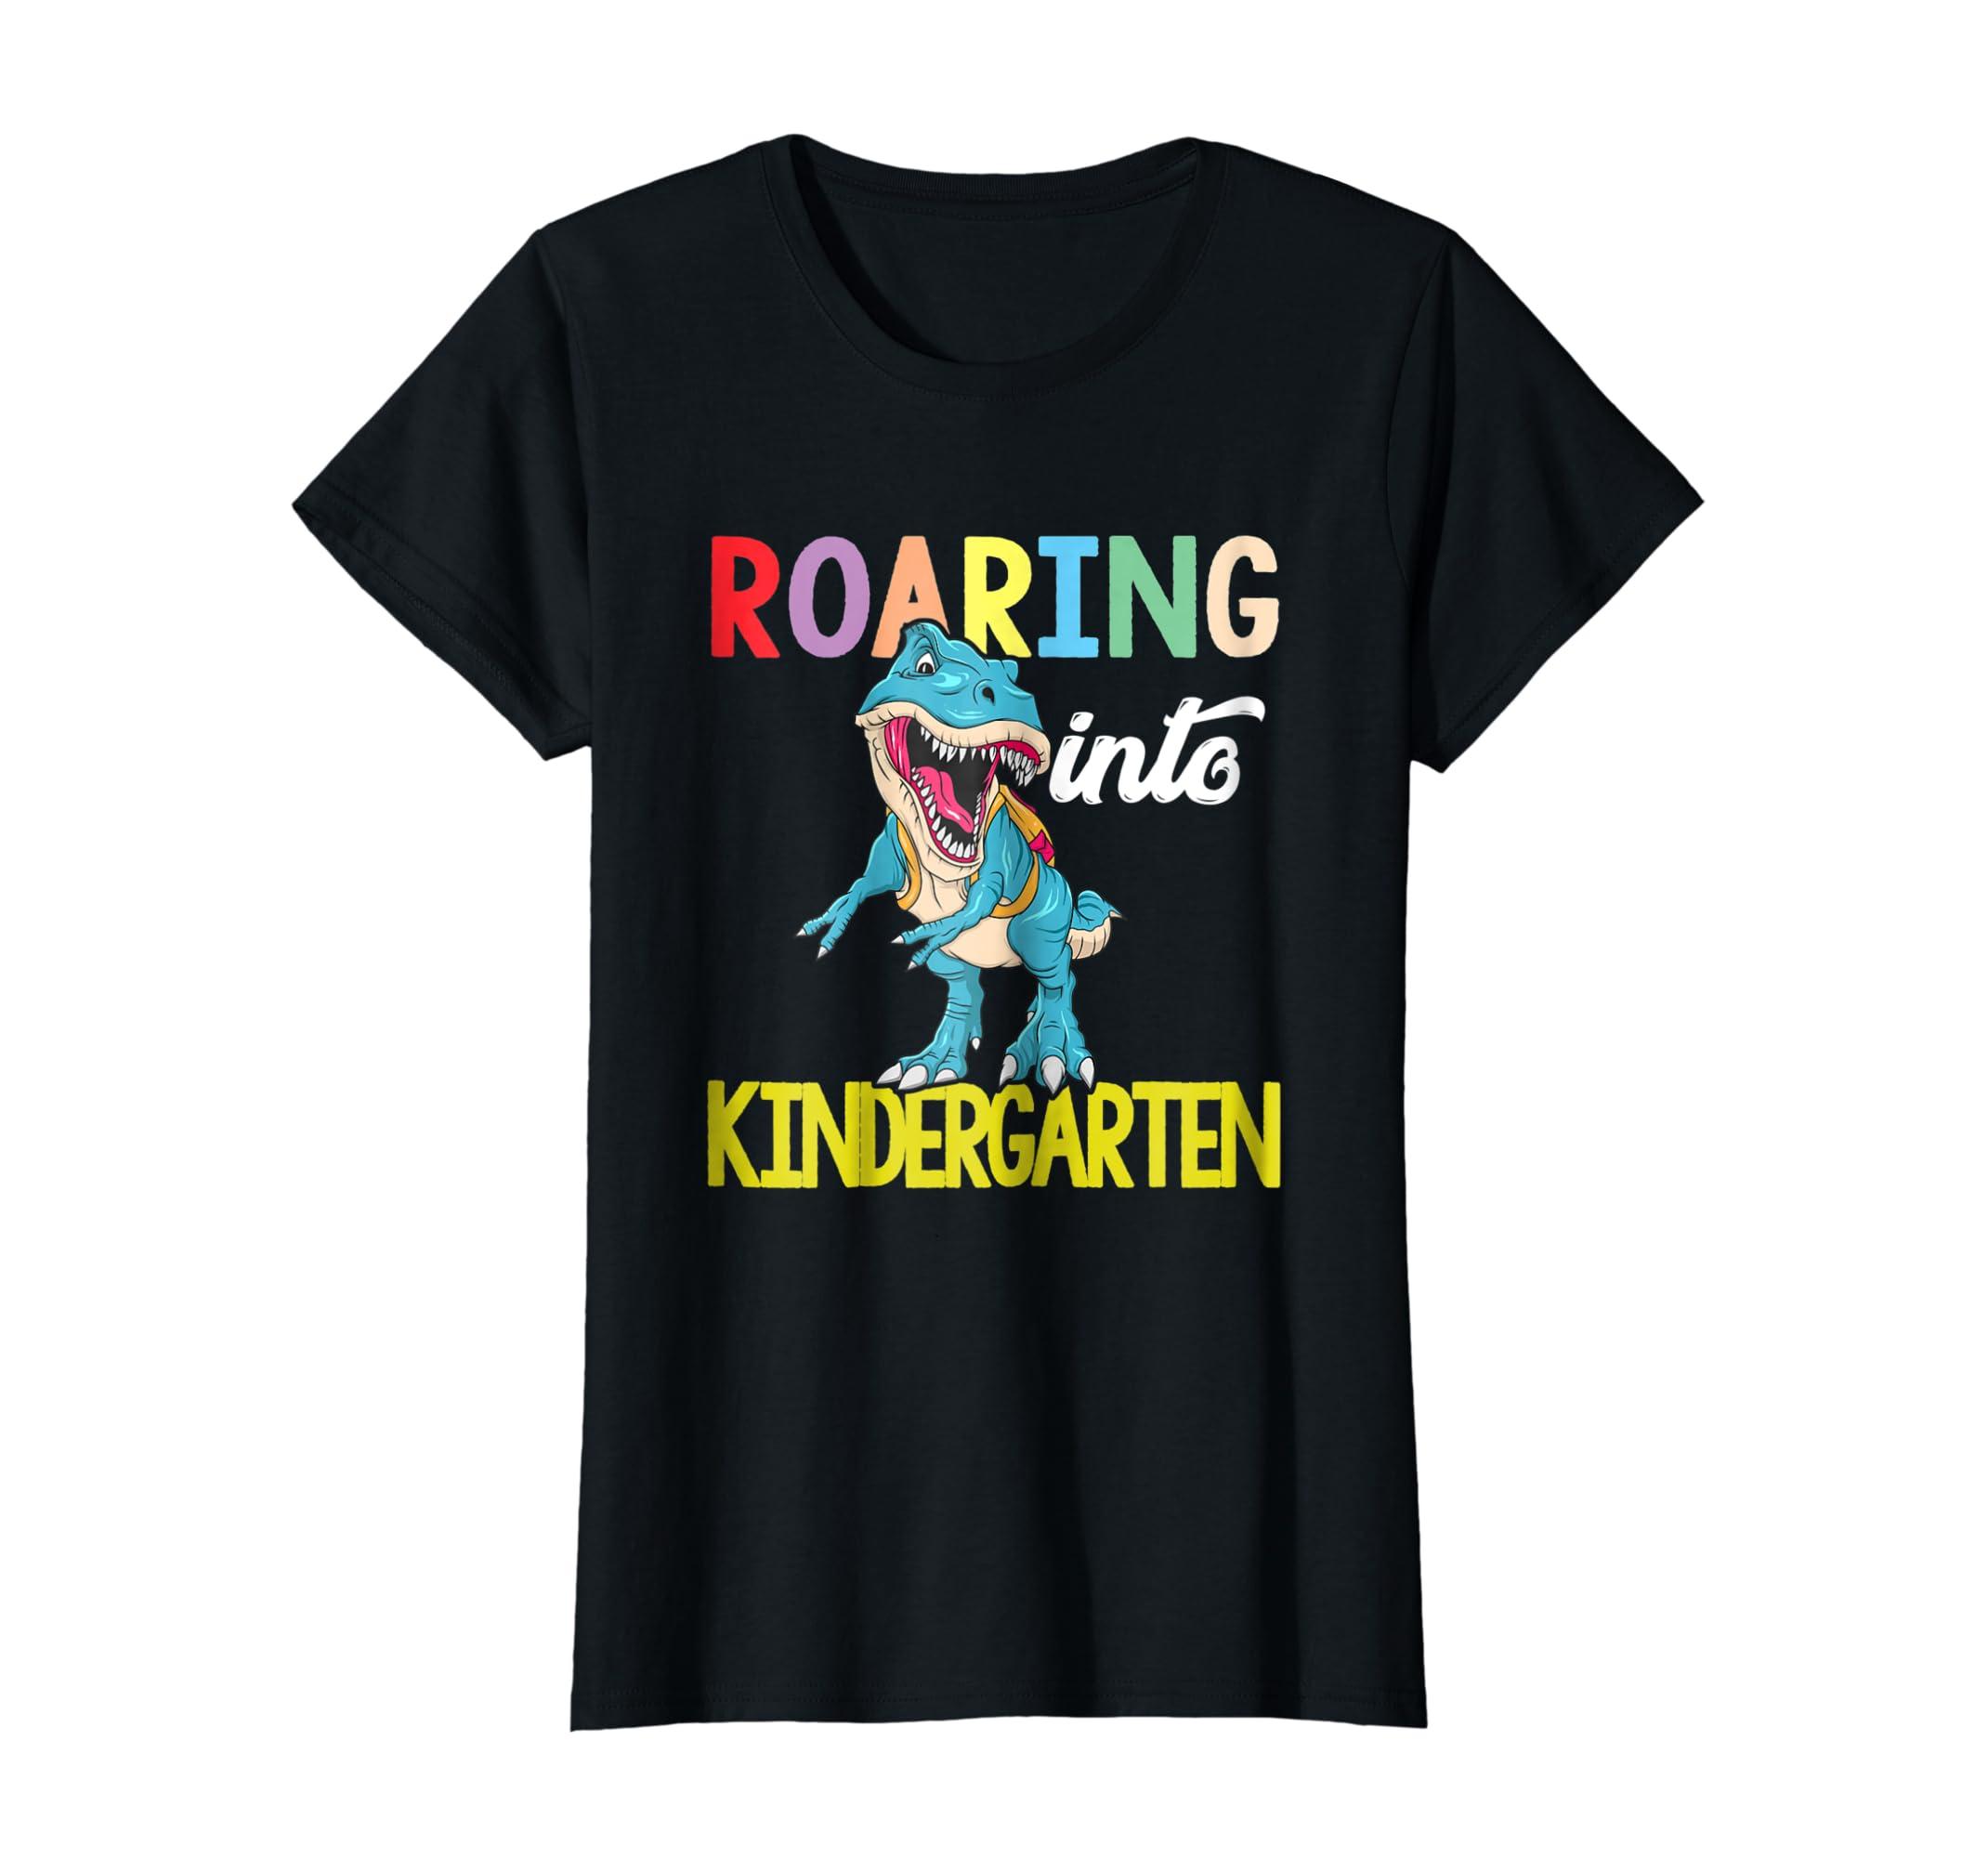 Funny Roaring Into Kindergarten Tyrannosaurus Rex Gift Shirt-Awarplus